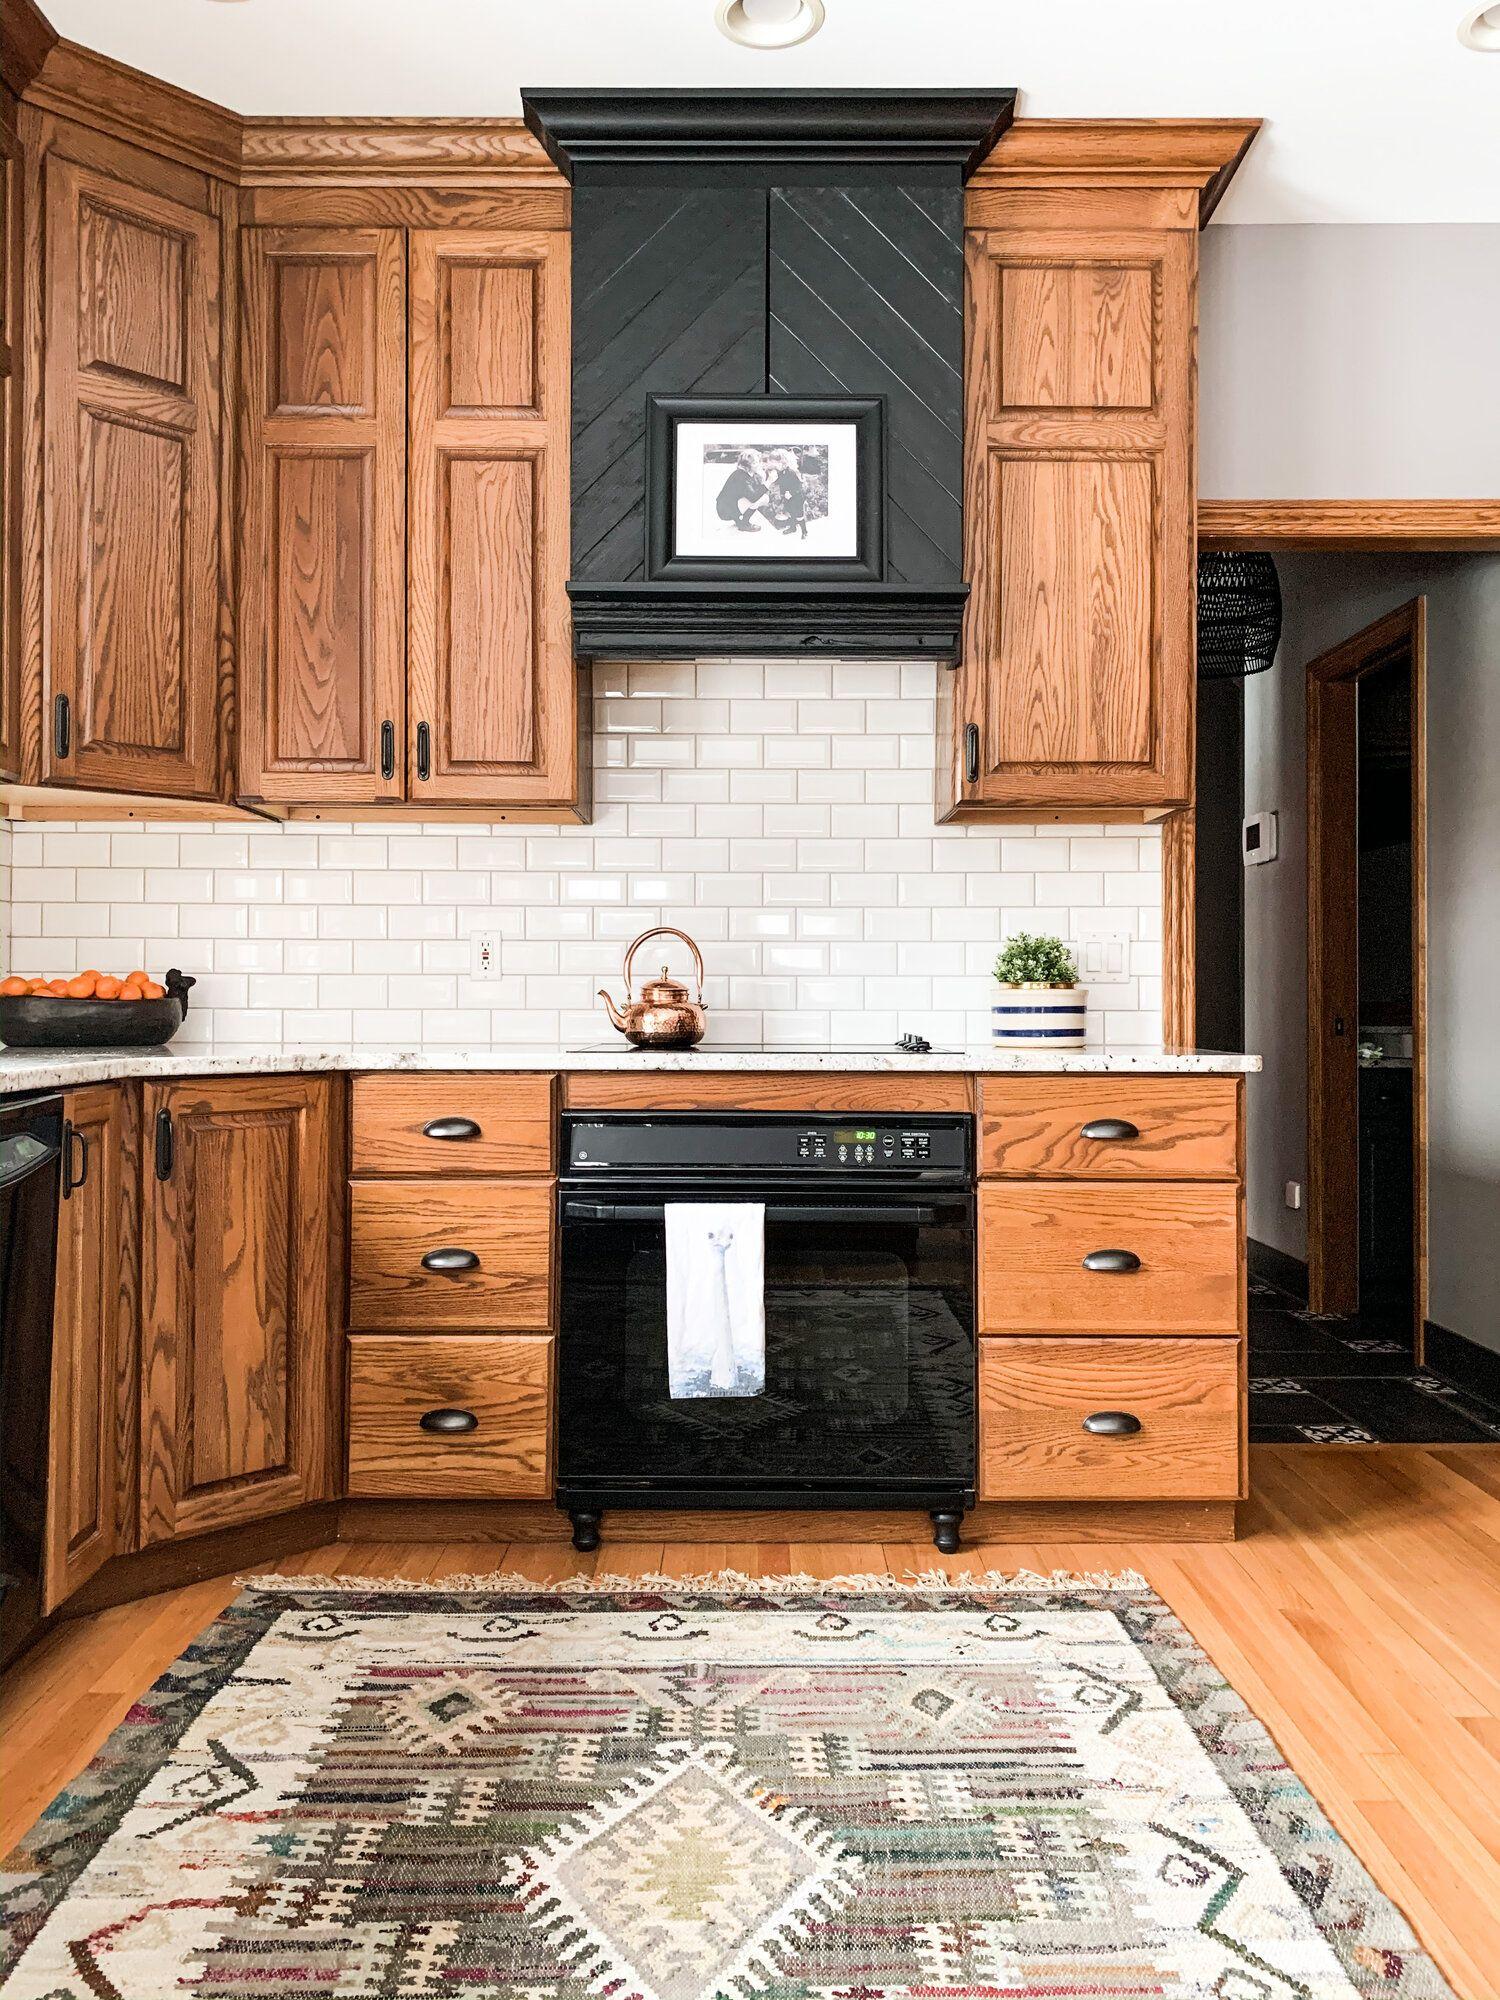 How to make an oak kitchen cool again :) — COPPER CORNERS